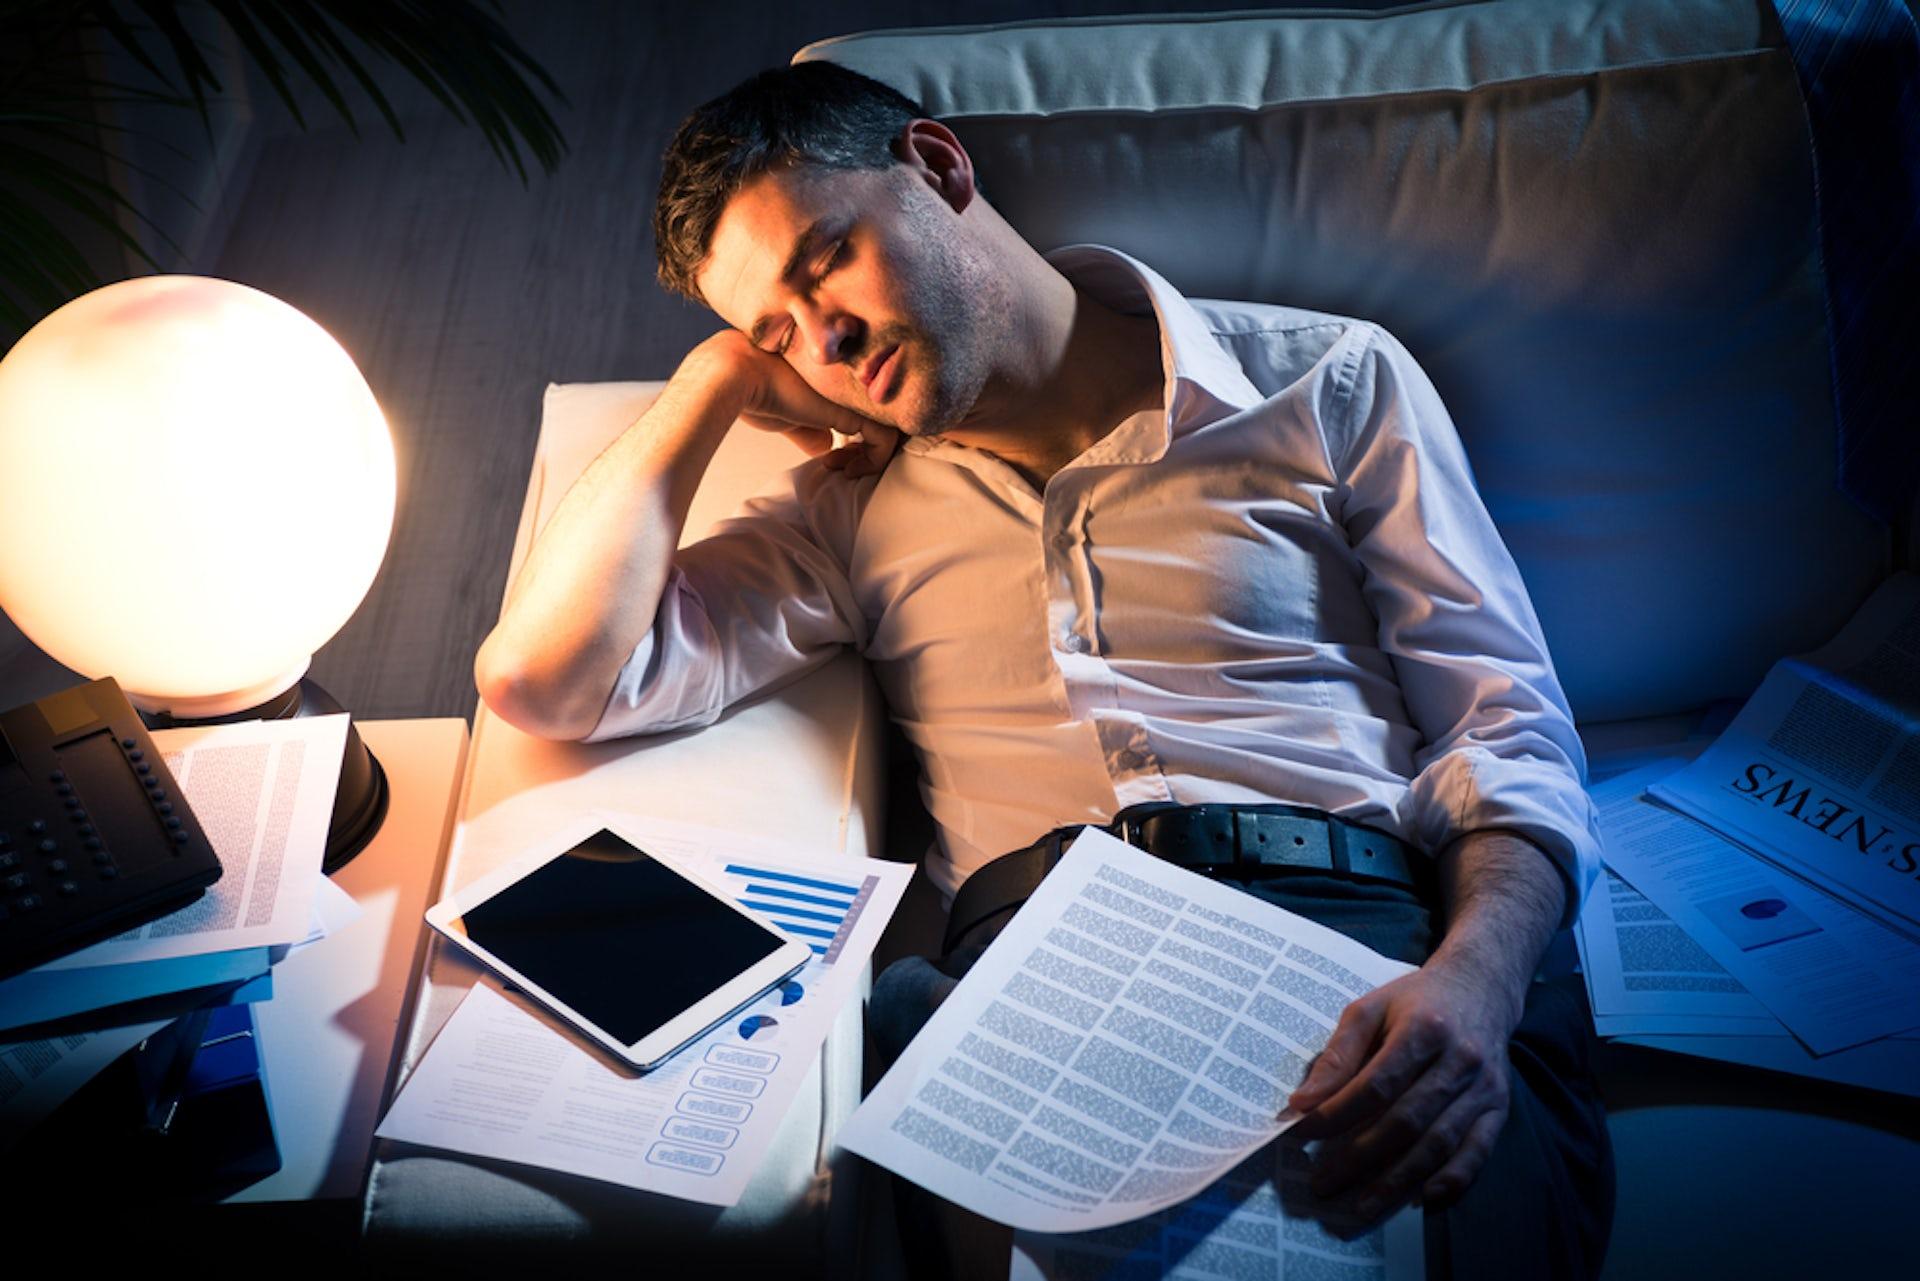 Helping men get work-life balance can help everyone